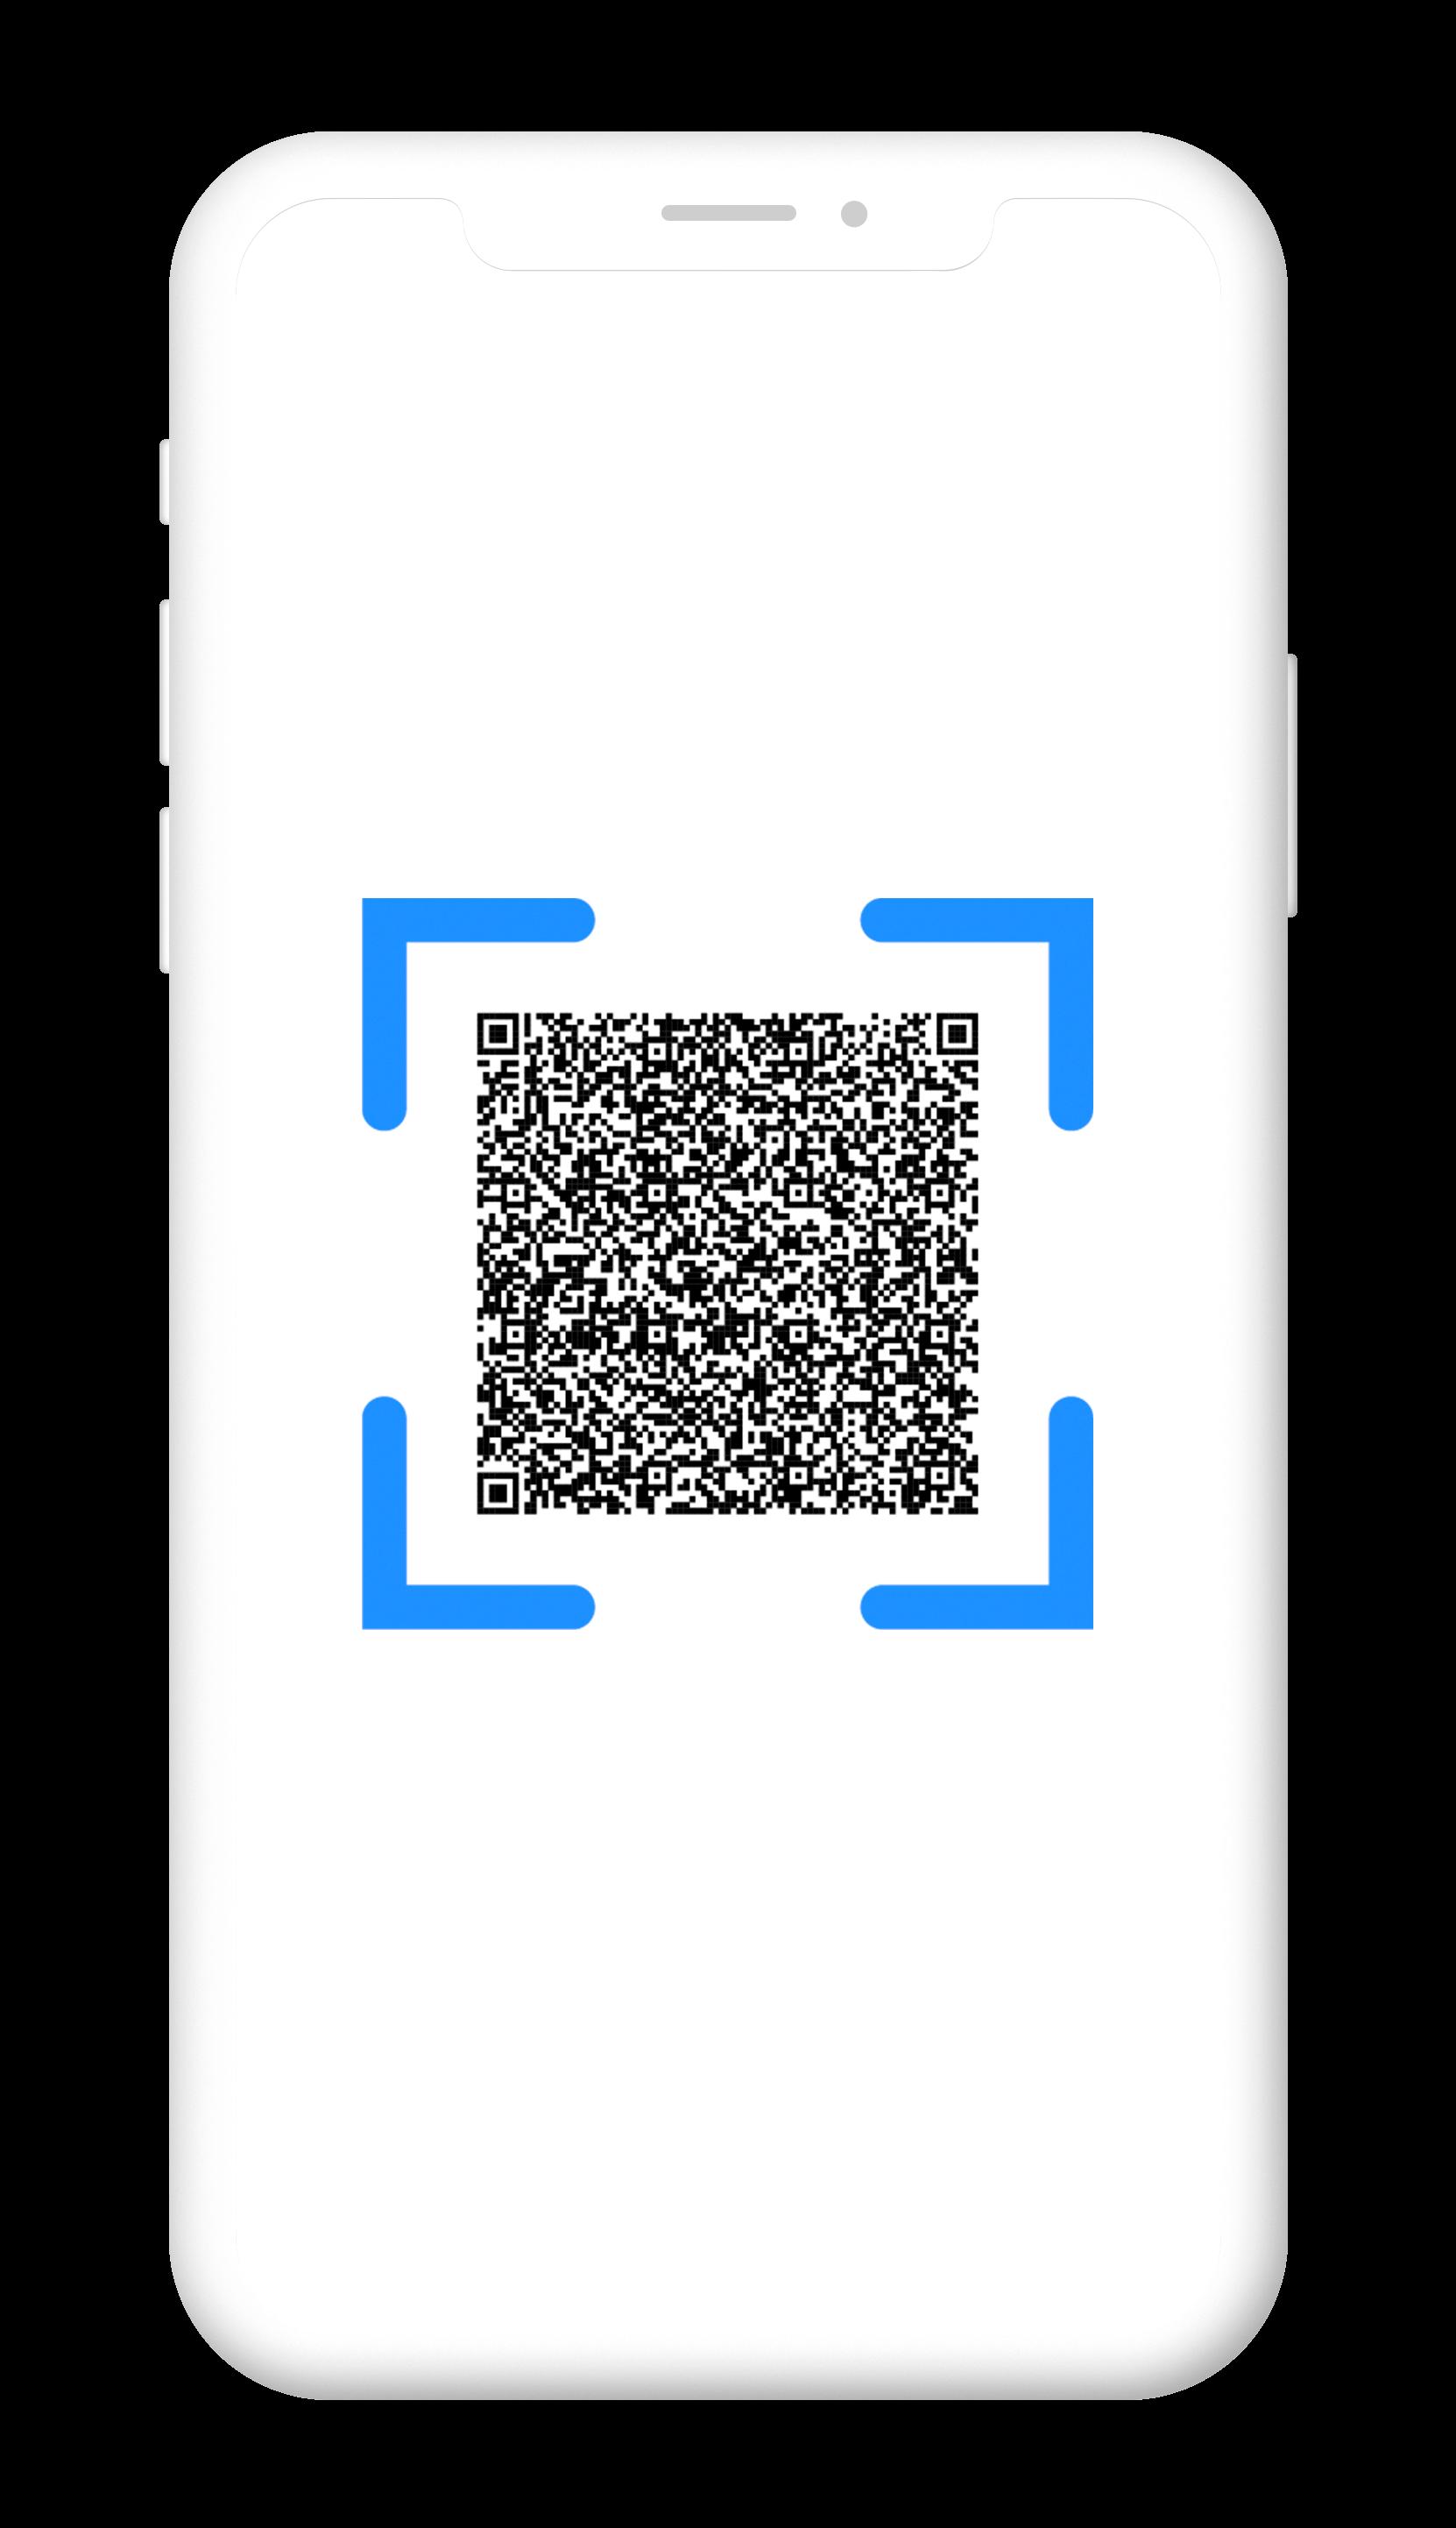 iPhone mit Termincode